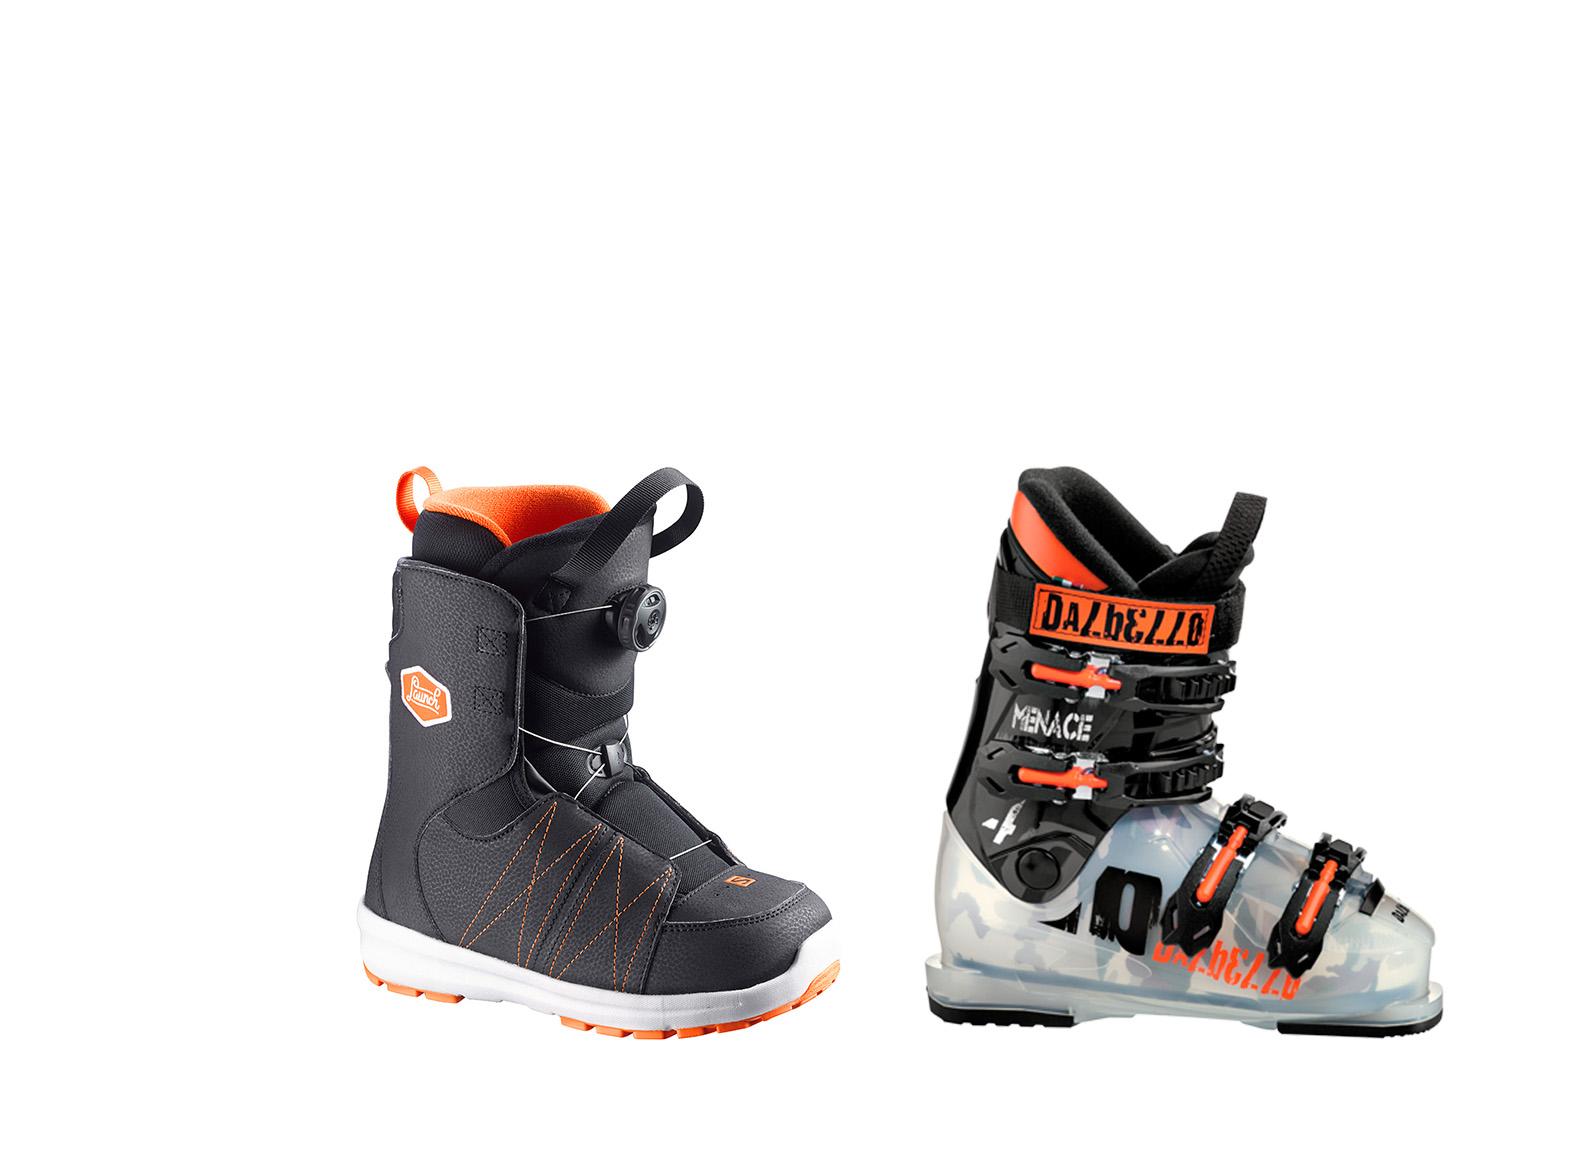 SKI-SNB-Schuhe-boots-Rent-sport-SAILER-Seefeld-Rosshuette-Tirol-Oesterreich-002